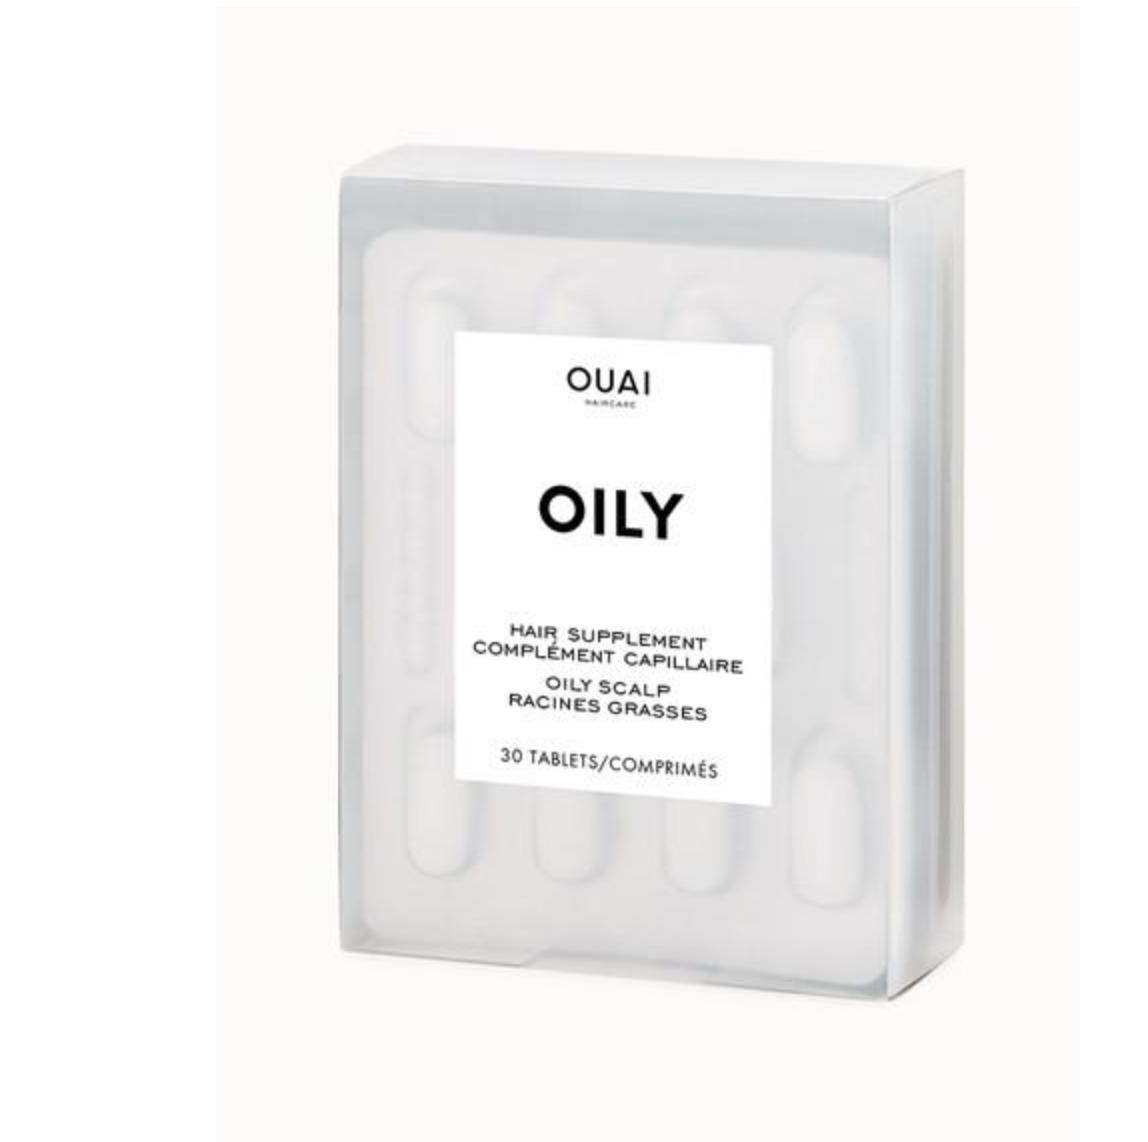 Ouai Oily Hair Supplements, $28  Net-A-Porter.com